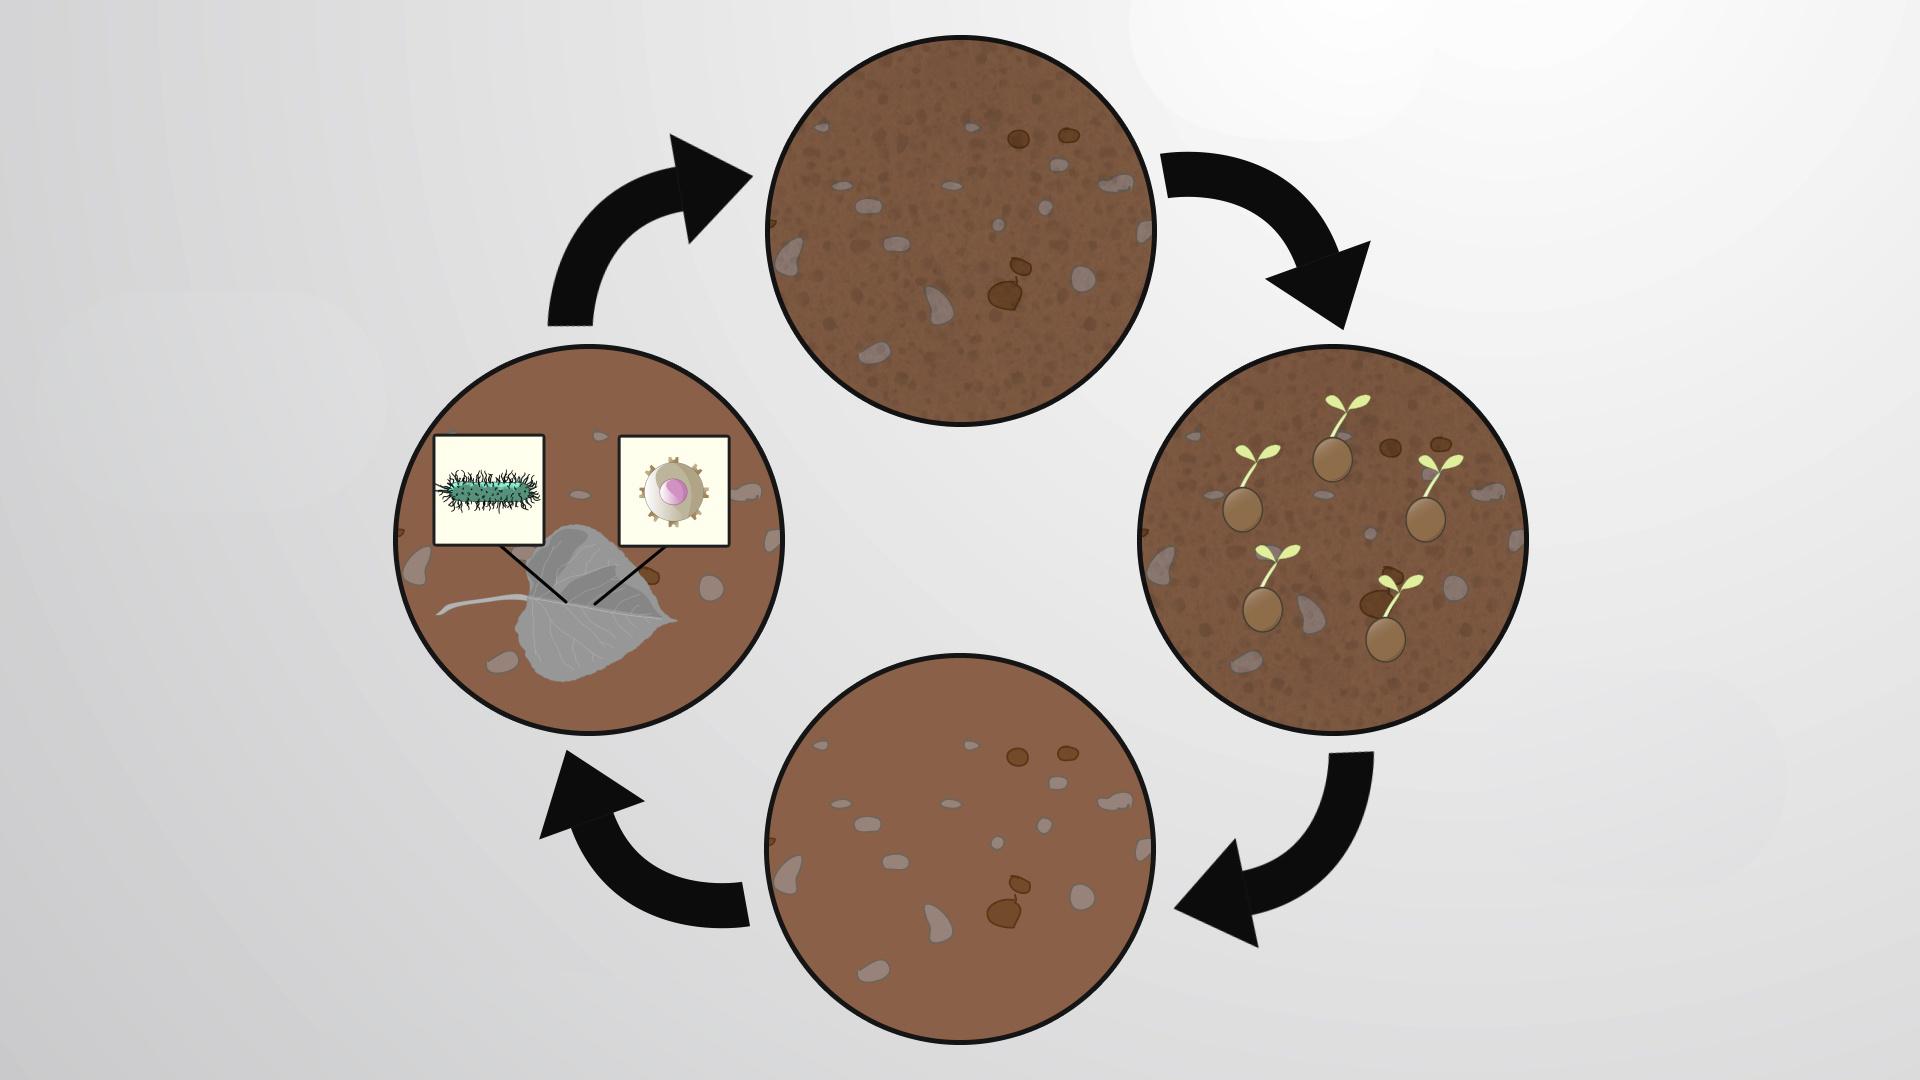 The Soil Ecosystem